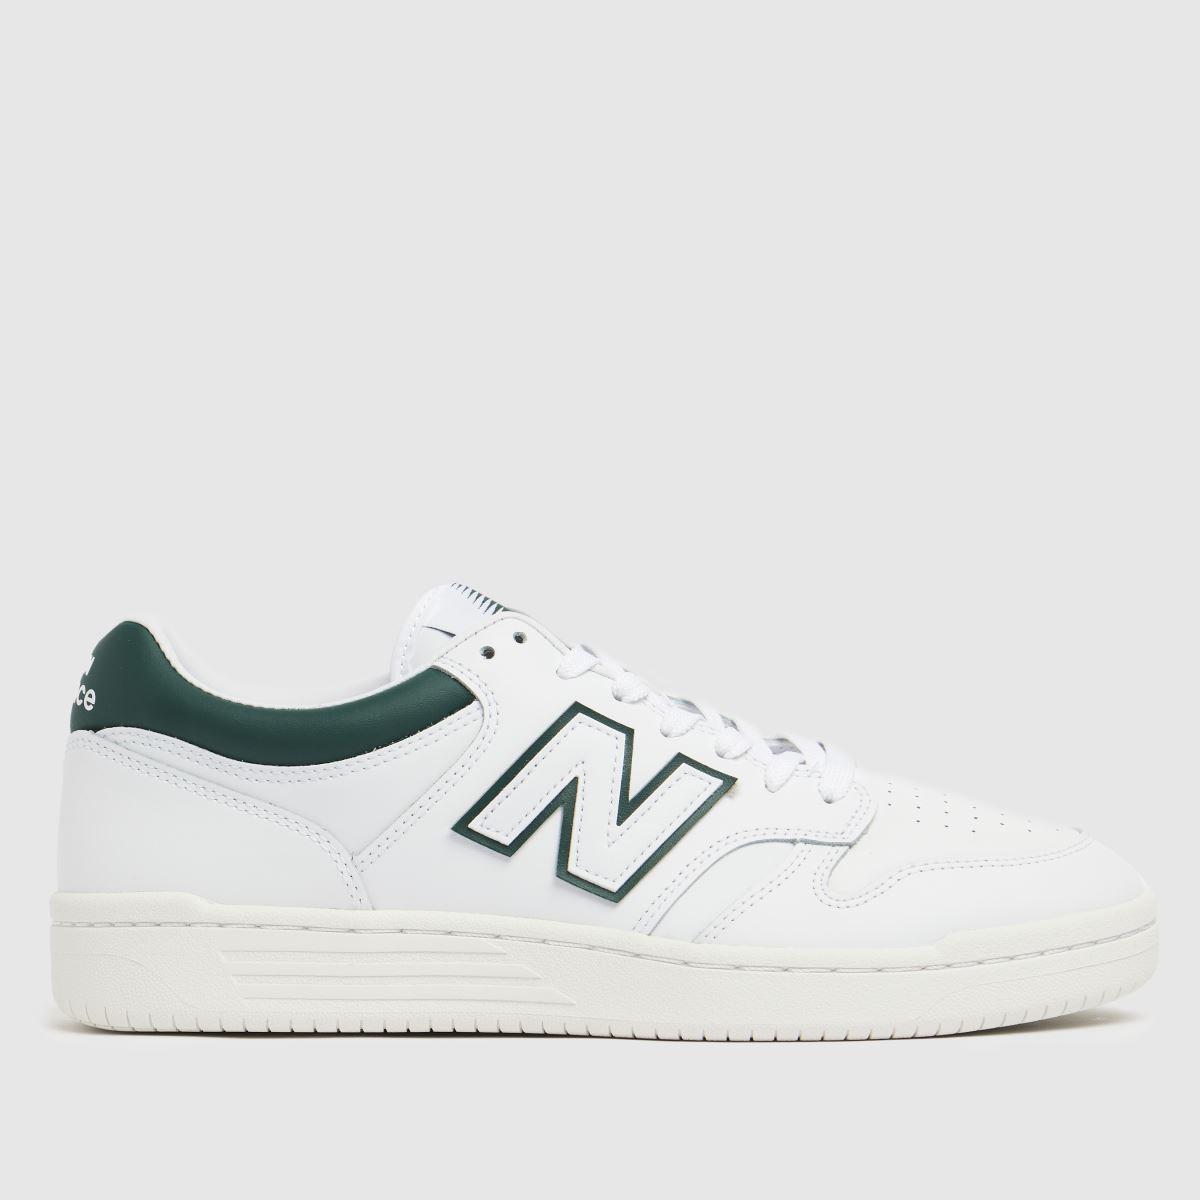 New Balance White & Green 480 Trainers